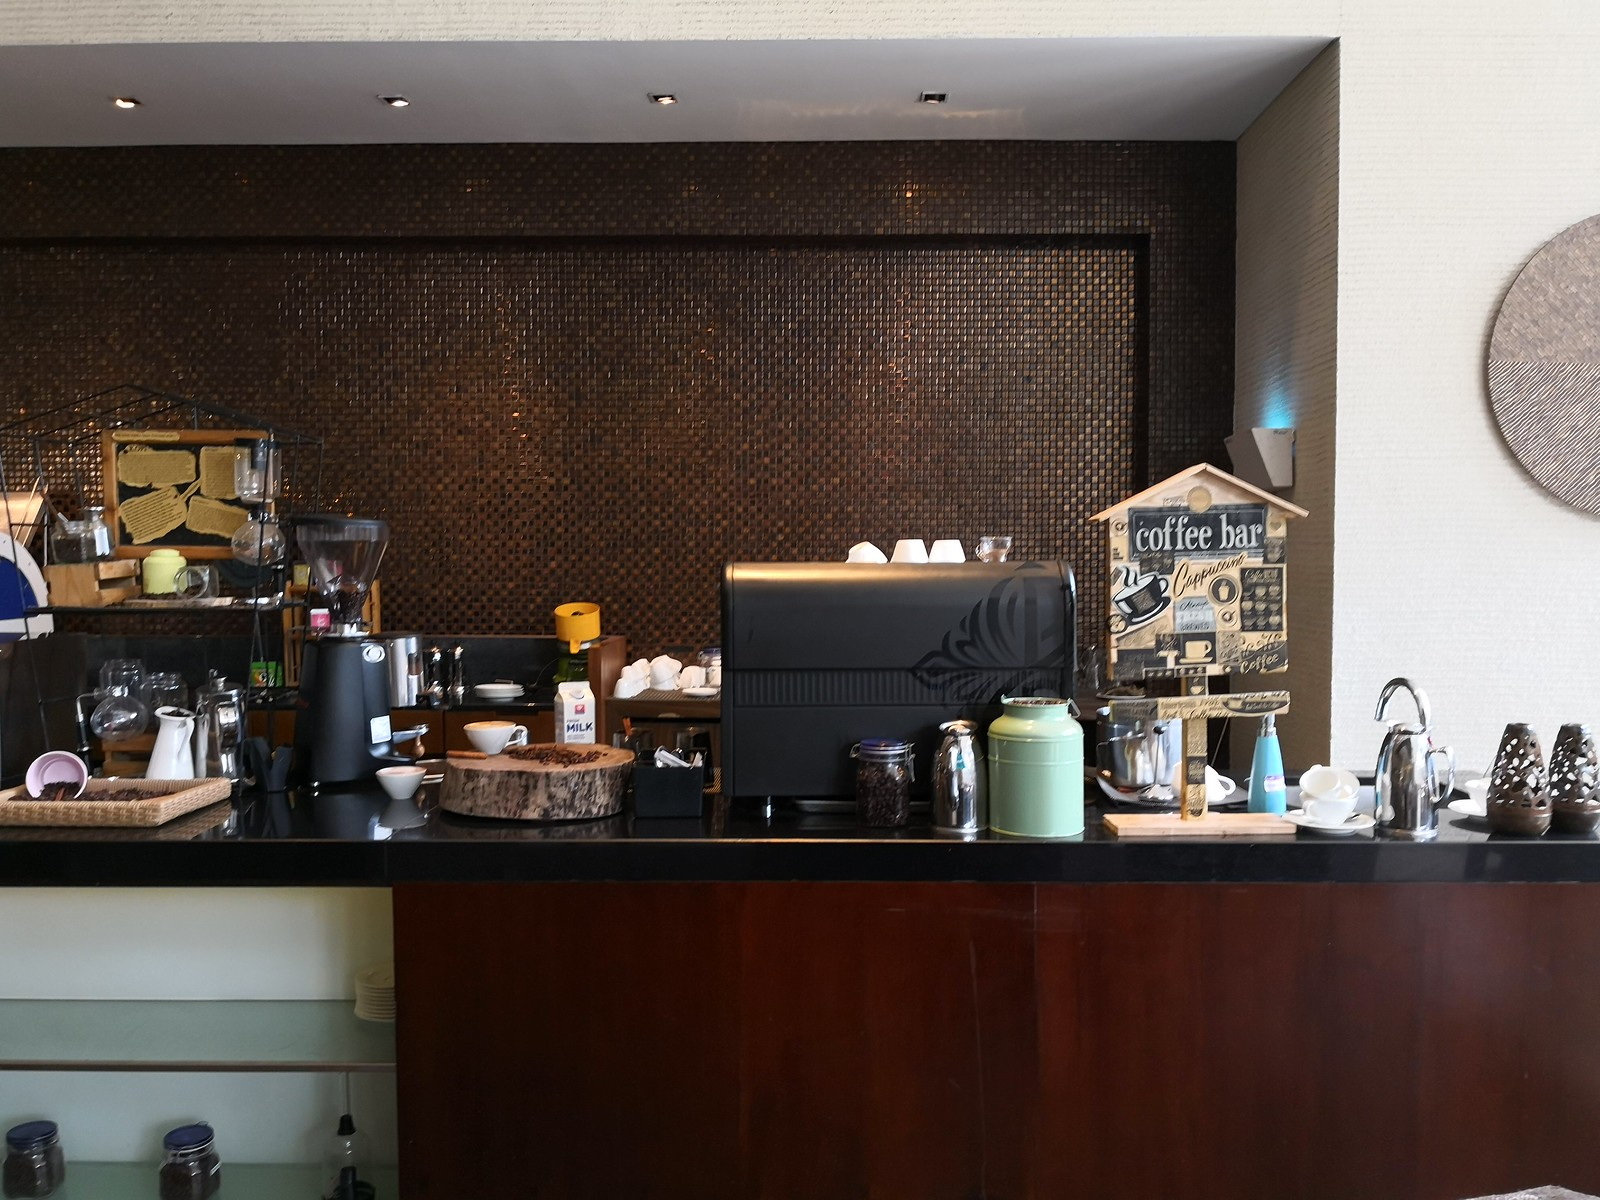 Cafe setup in the restaurant